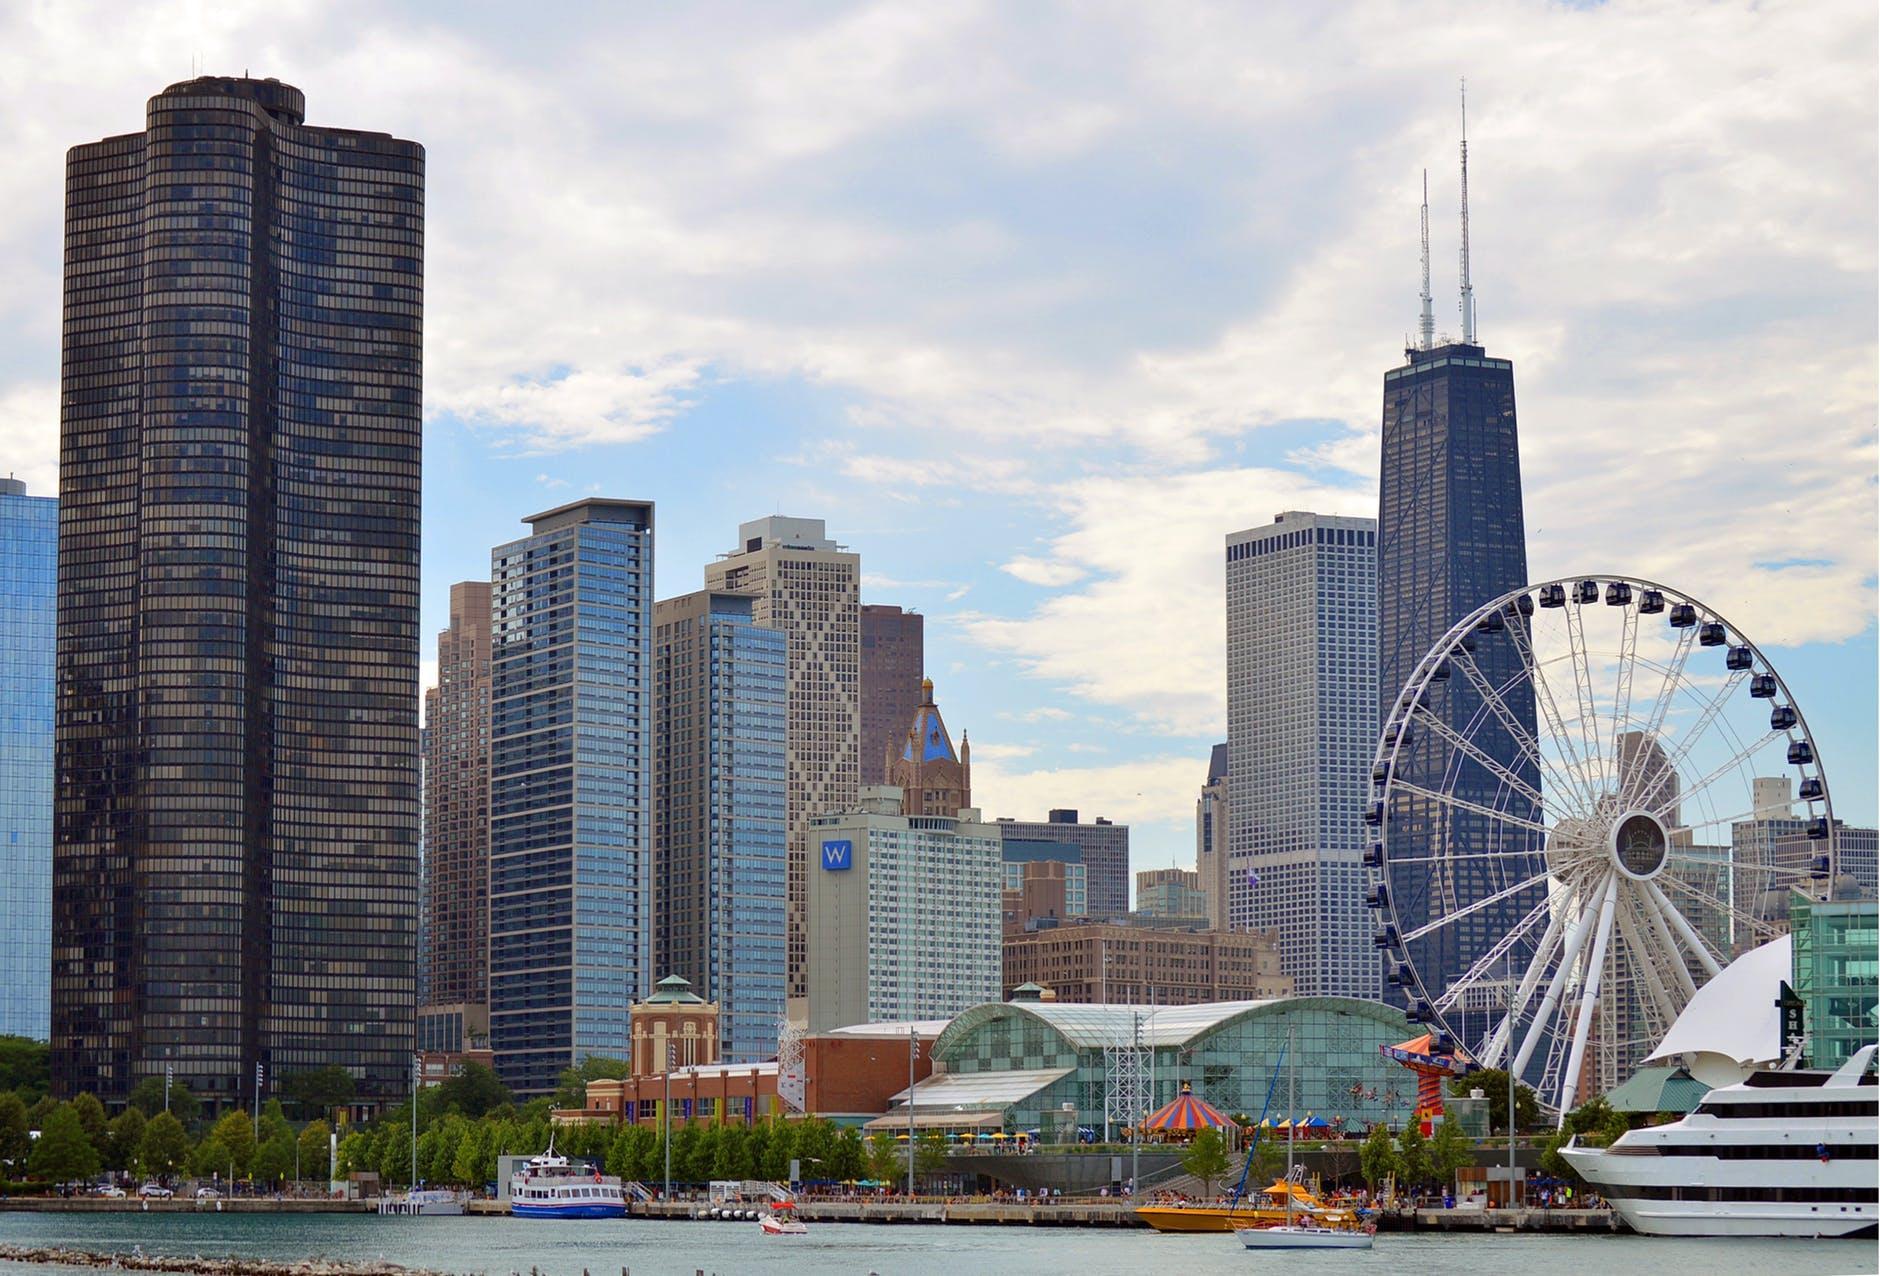 chicago-illinois-skyline-skyscrapers-161963-1535396548322-1535396550175.jpeg